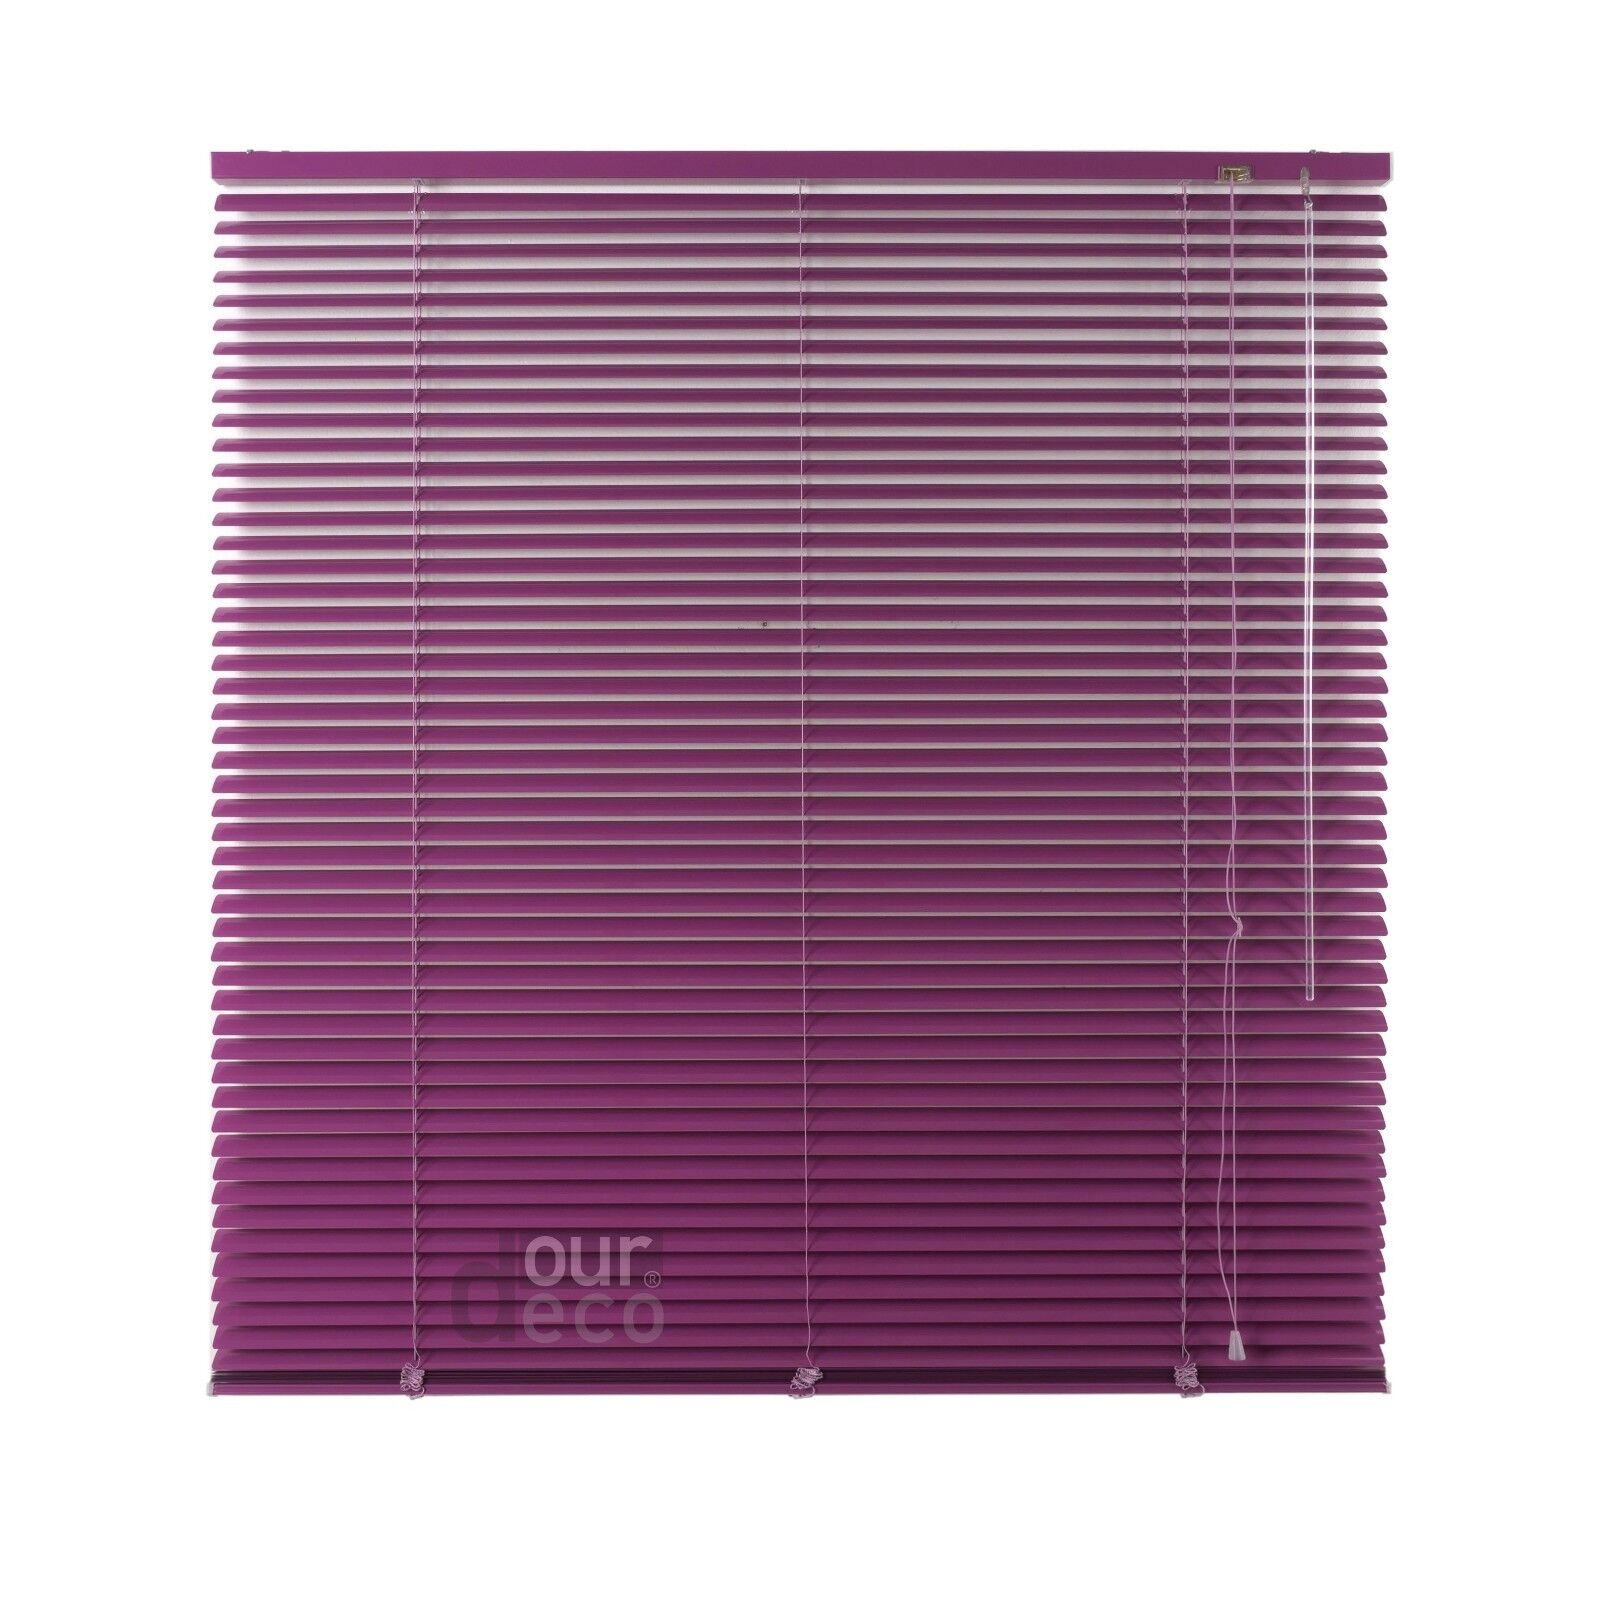 Ourdeco® Aluminium Jalousie Fenster Rollo Jalousette Länge 160 cm cm cm flieder f1afed